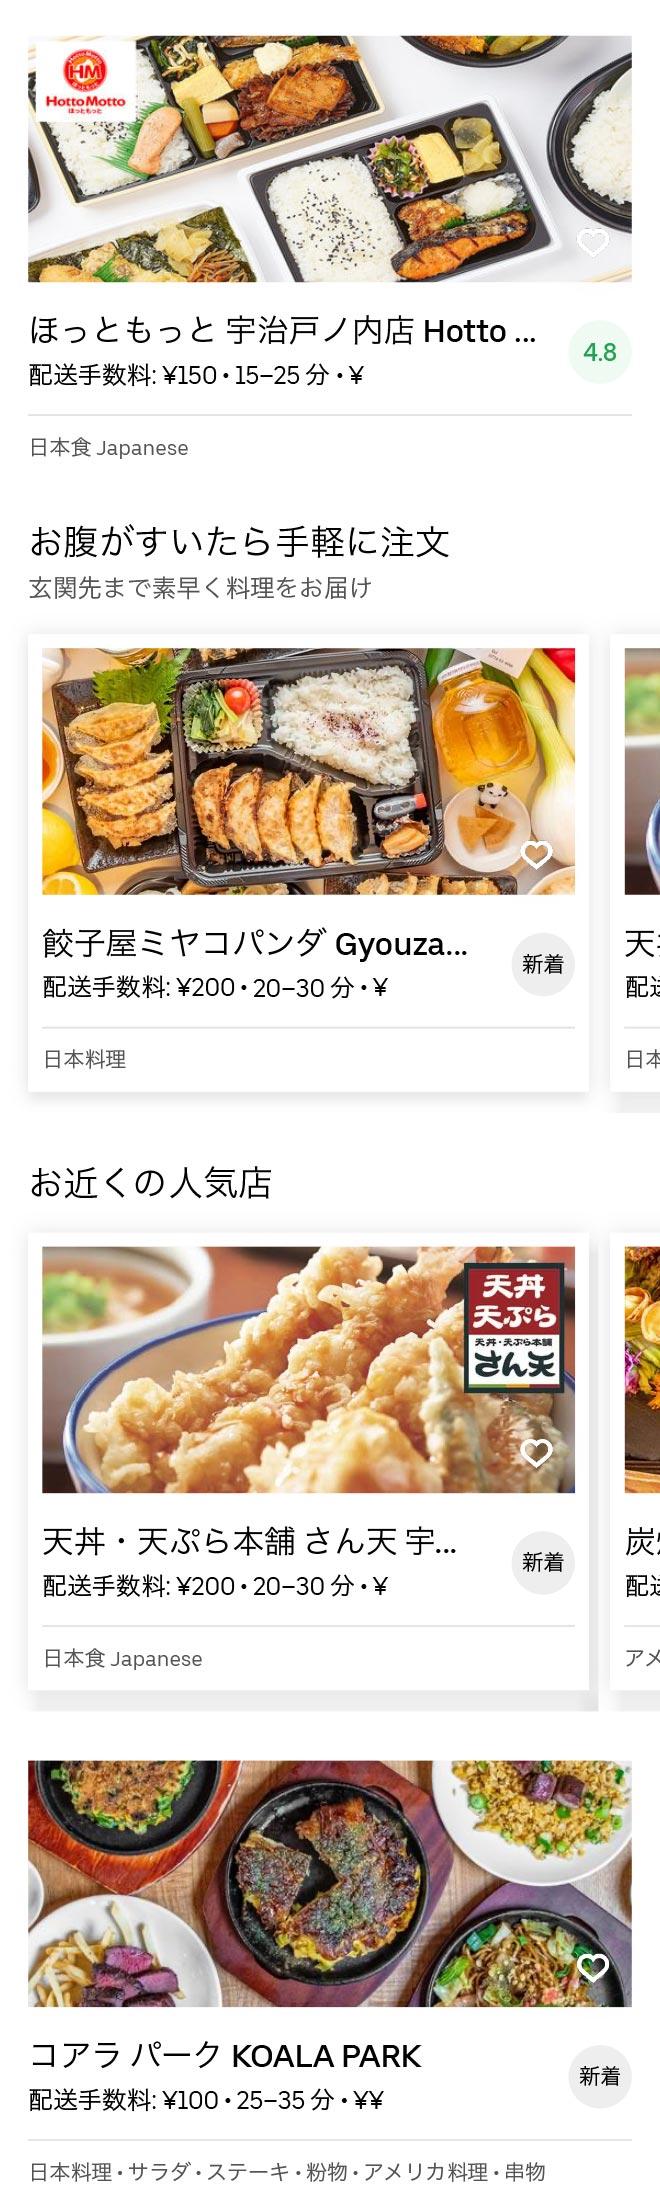 Uji menu 2005 01